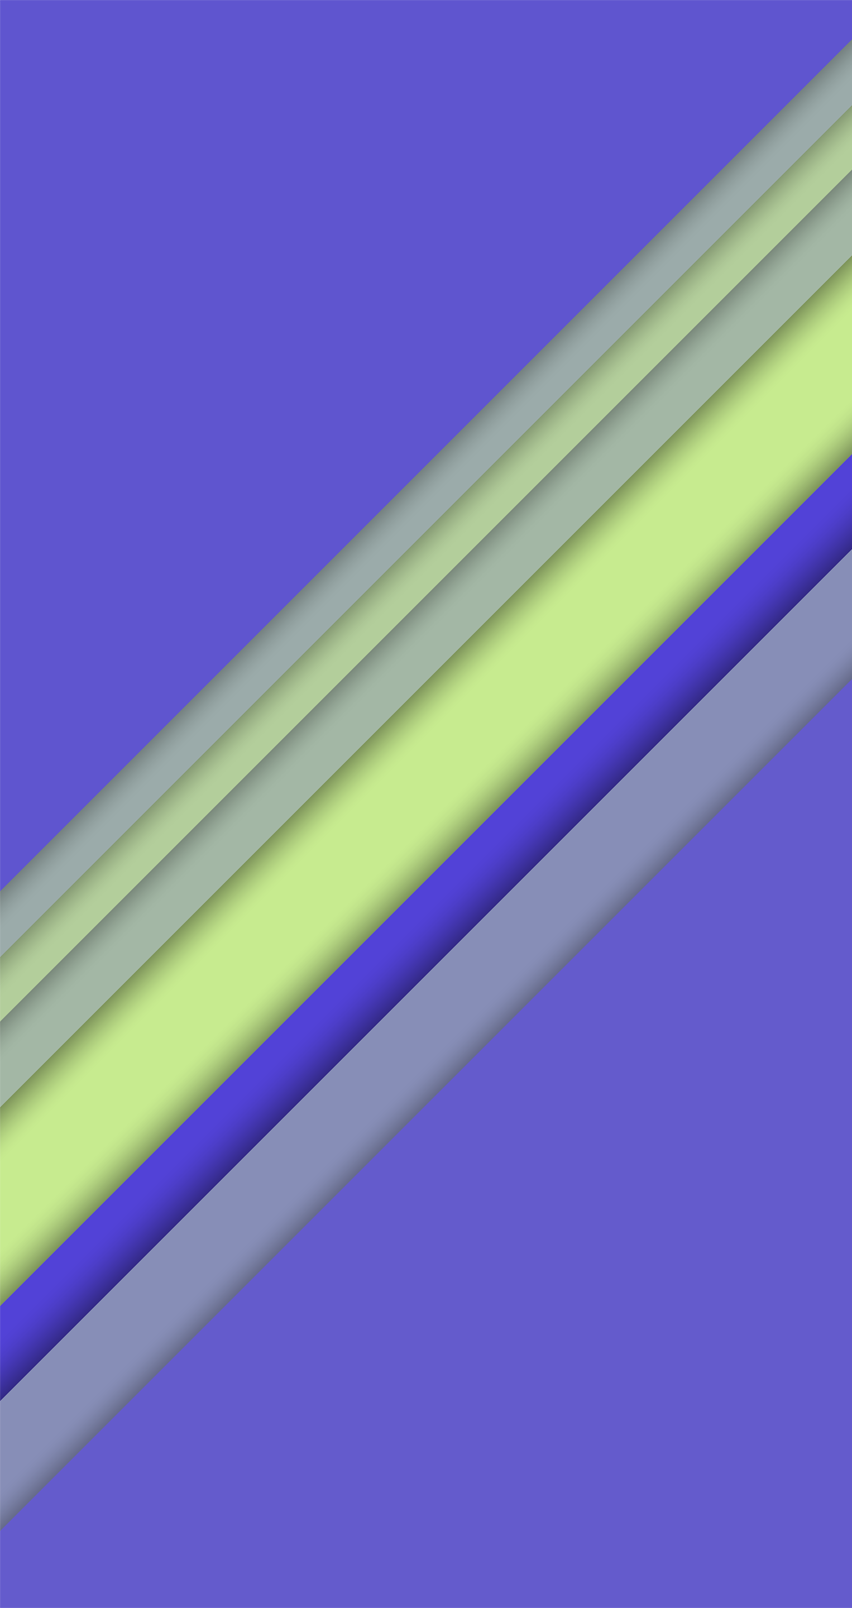 Simple stripes minimalist pattern wallpaper. Tap to see